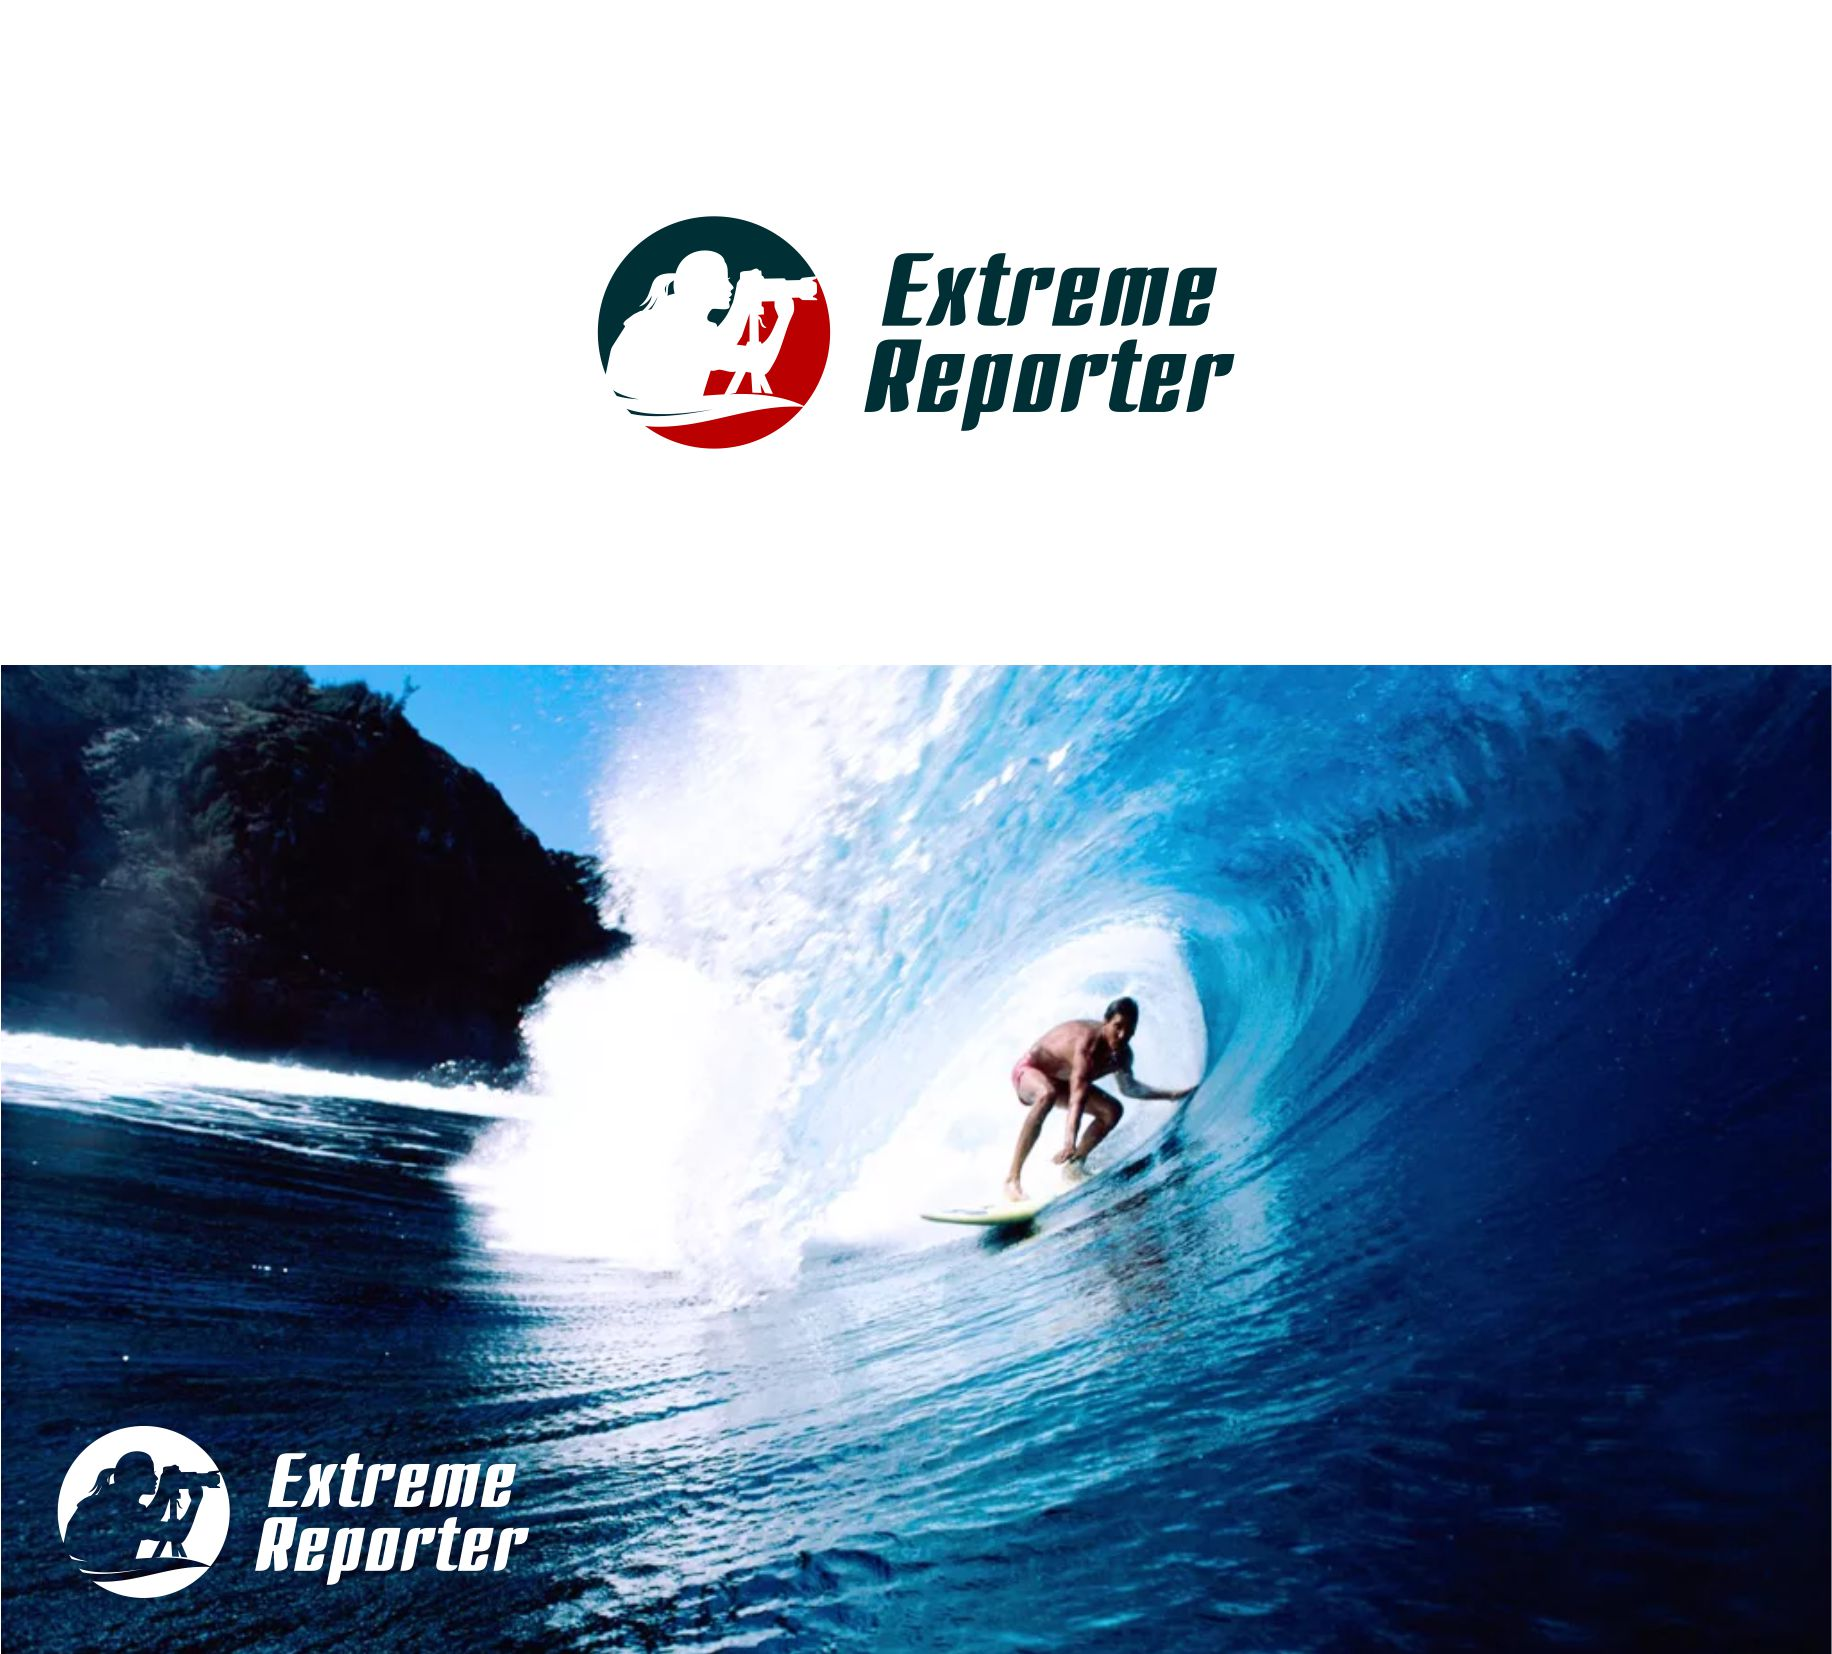 Логотип для экстрим фотографа.  фото f_2325a54d6125a56e.jpg